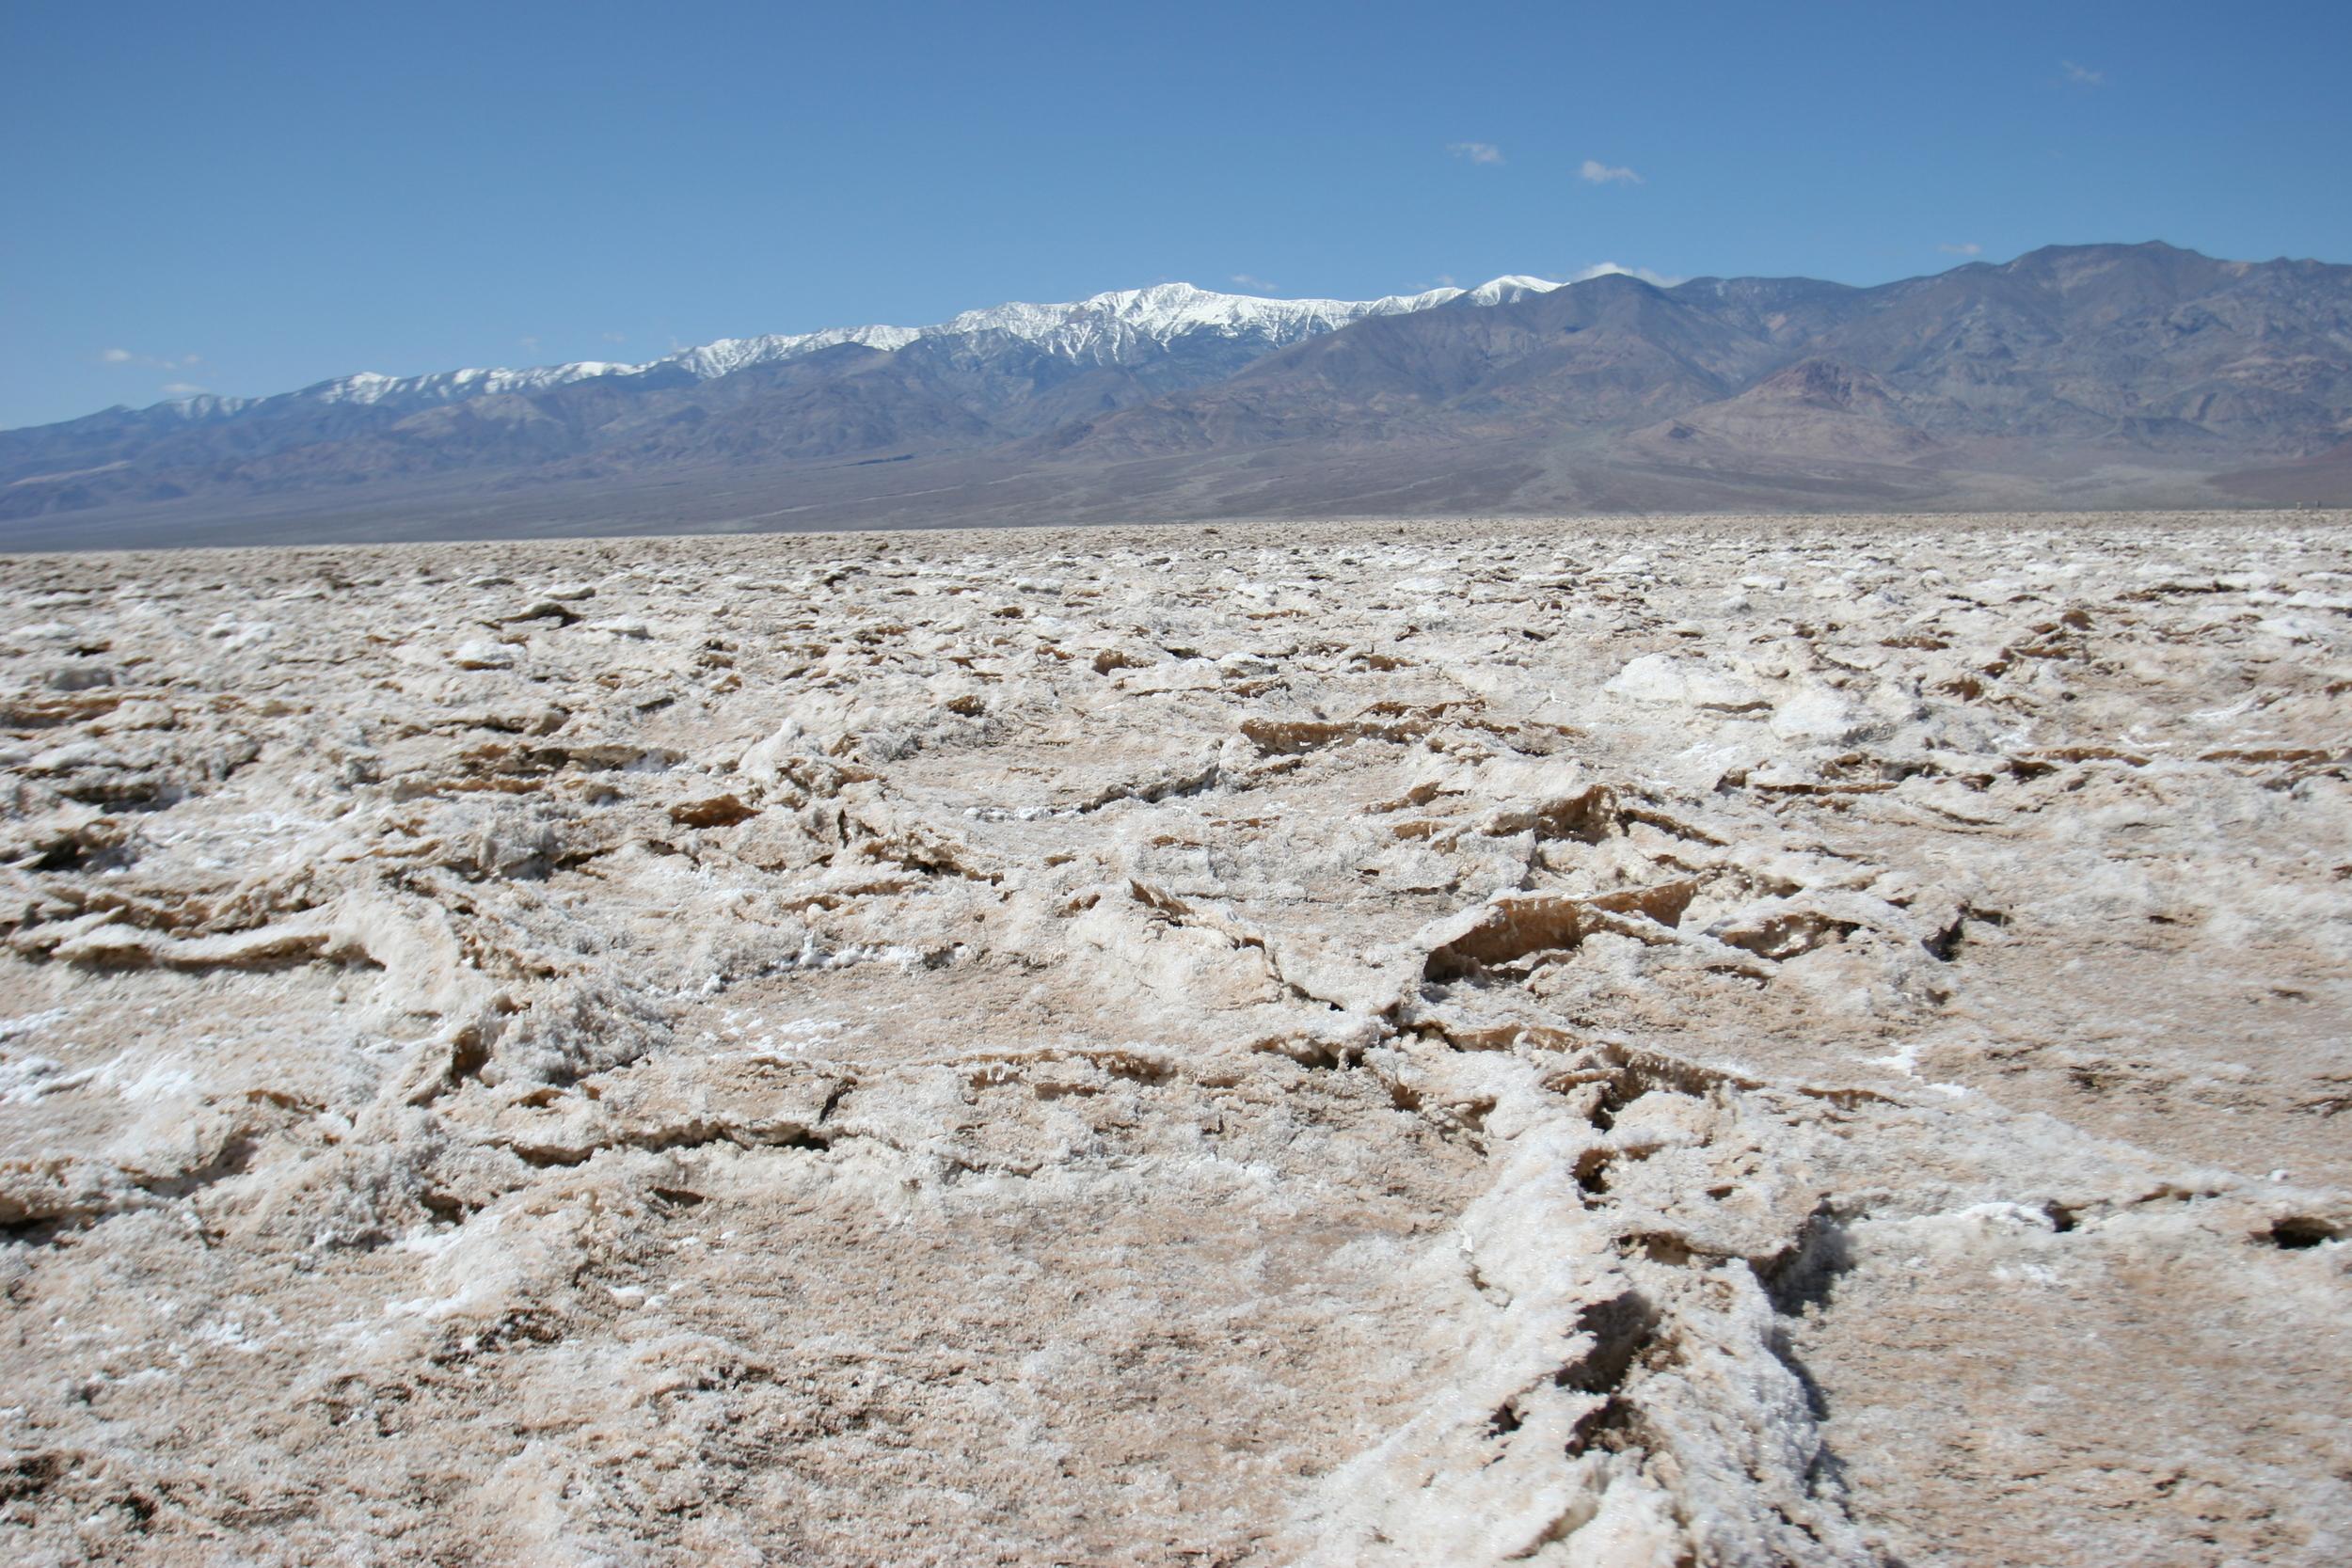 Devil's Golf Course, Telescope Peak, Death Valley